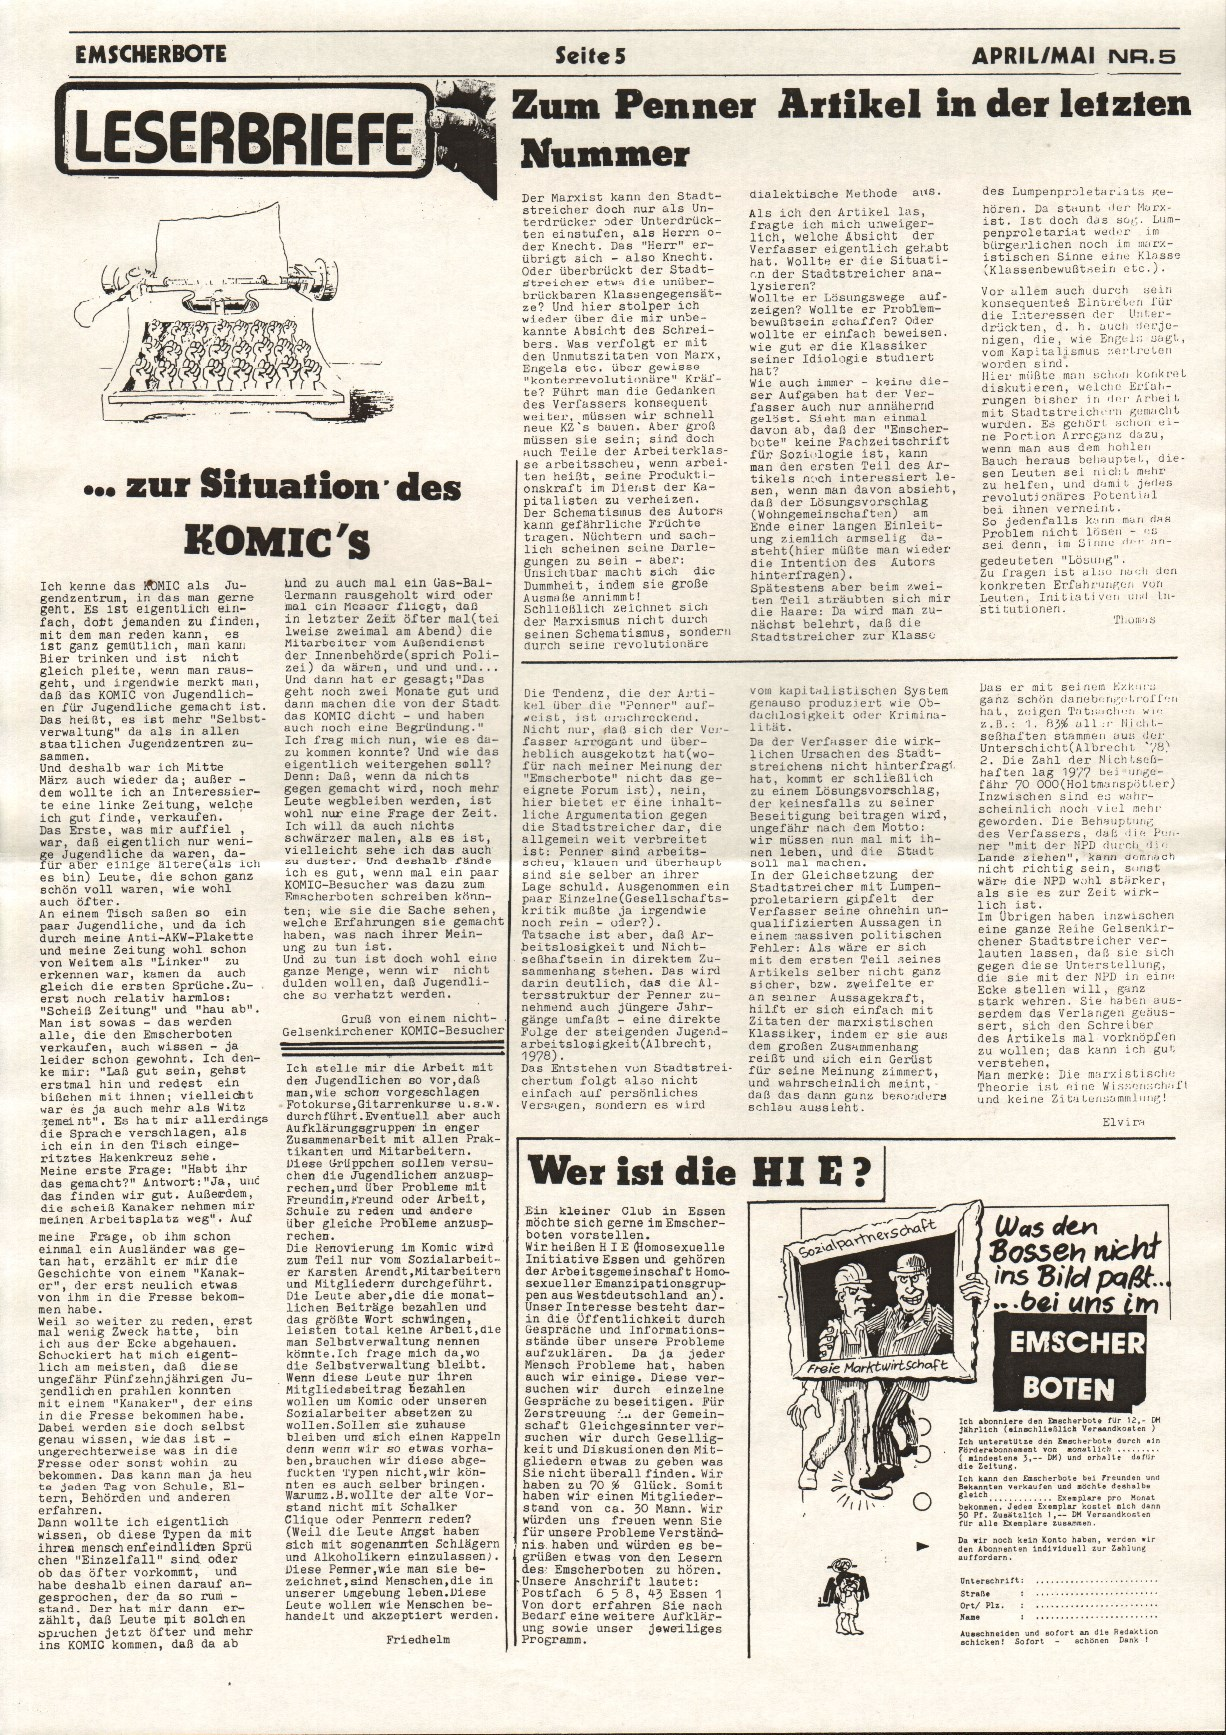 Gelsenkirchen_Emscherbote_1978_05_05